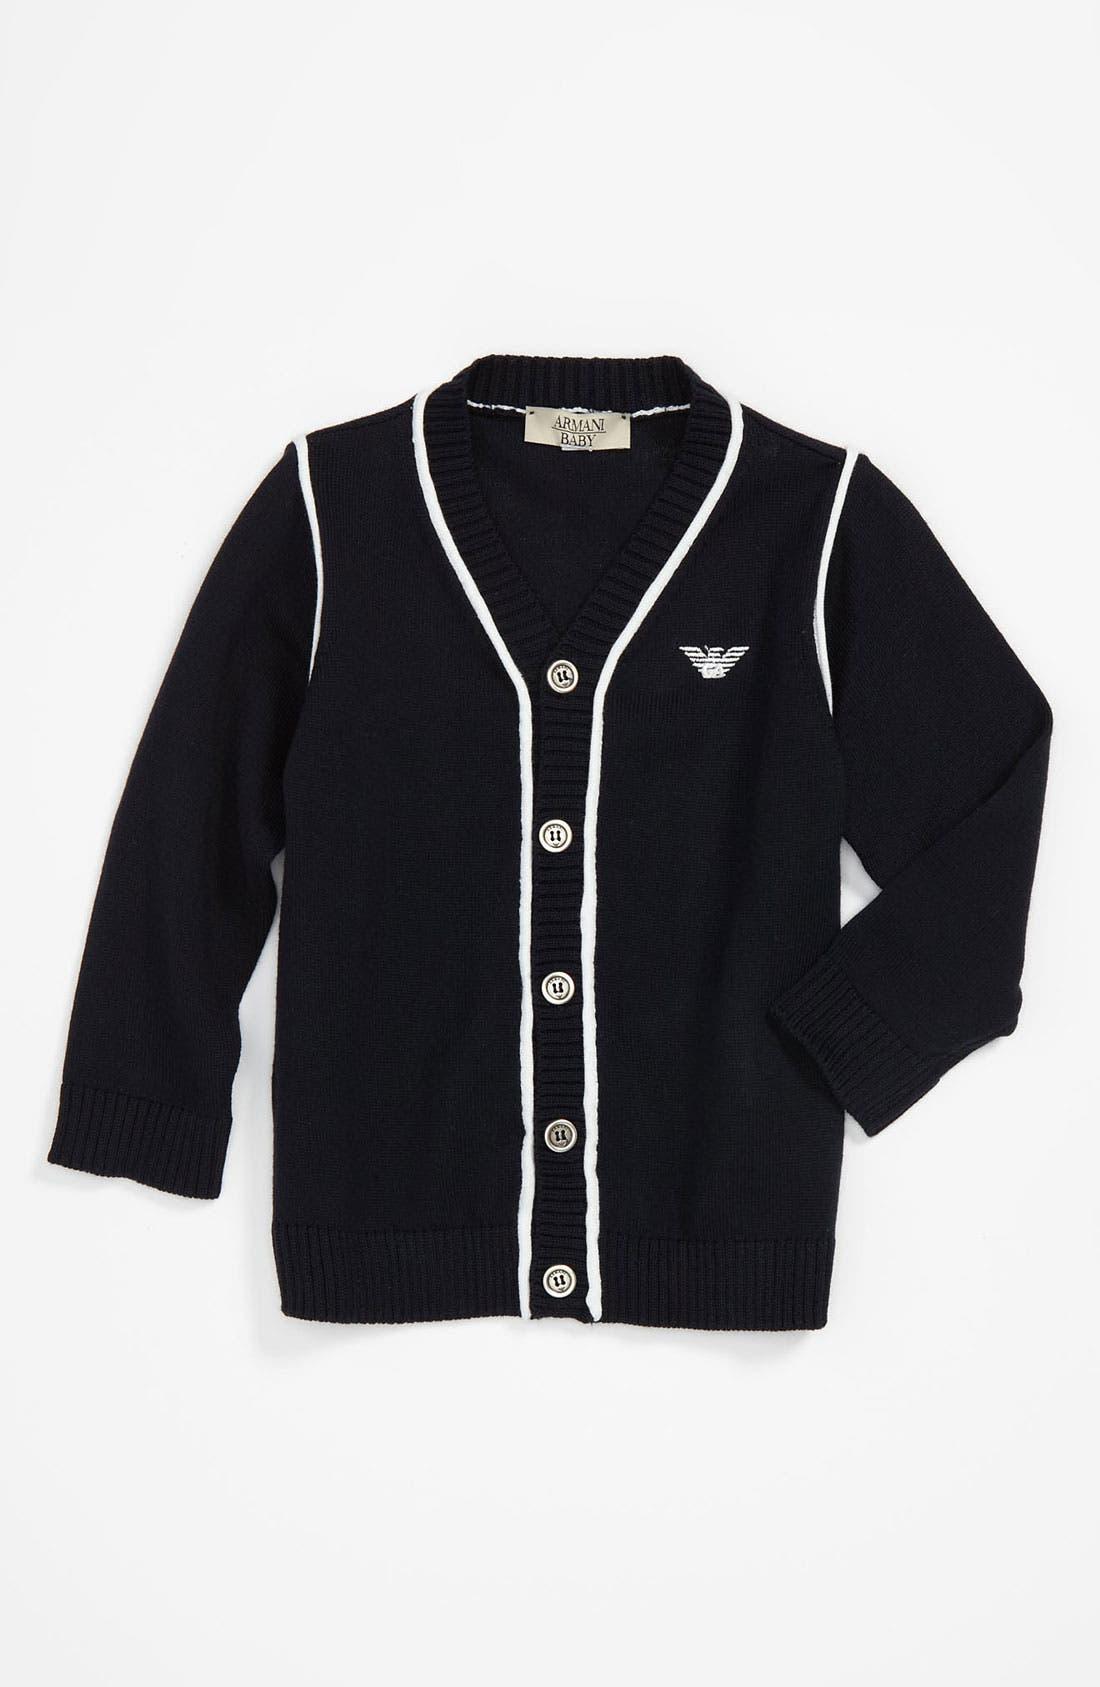 Alternate Image 1 Selected - Armani Junior Cardigan (Infant)